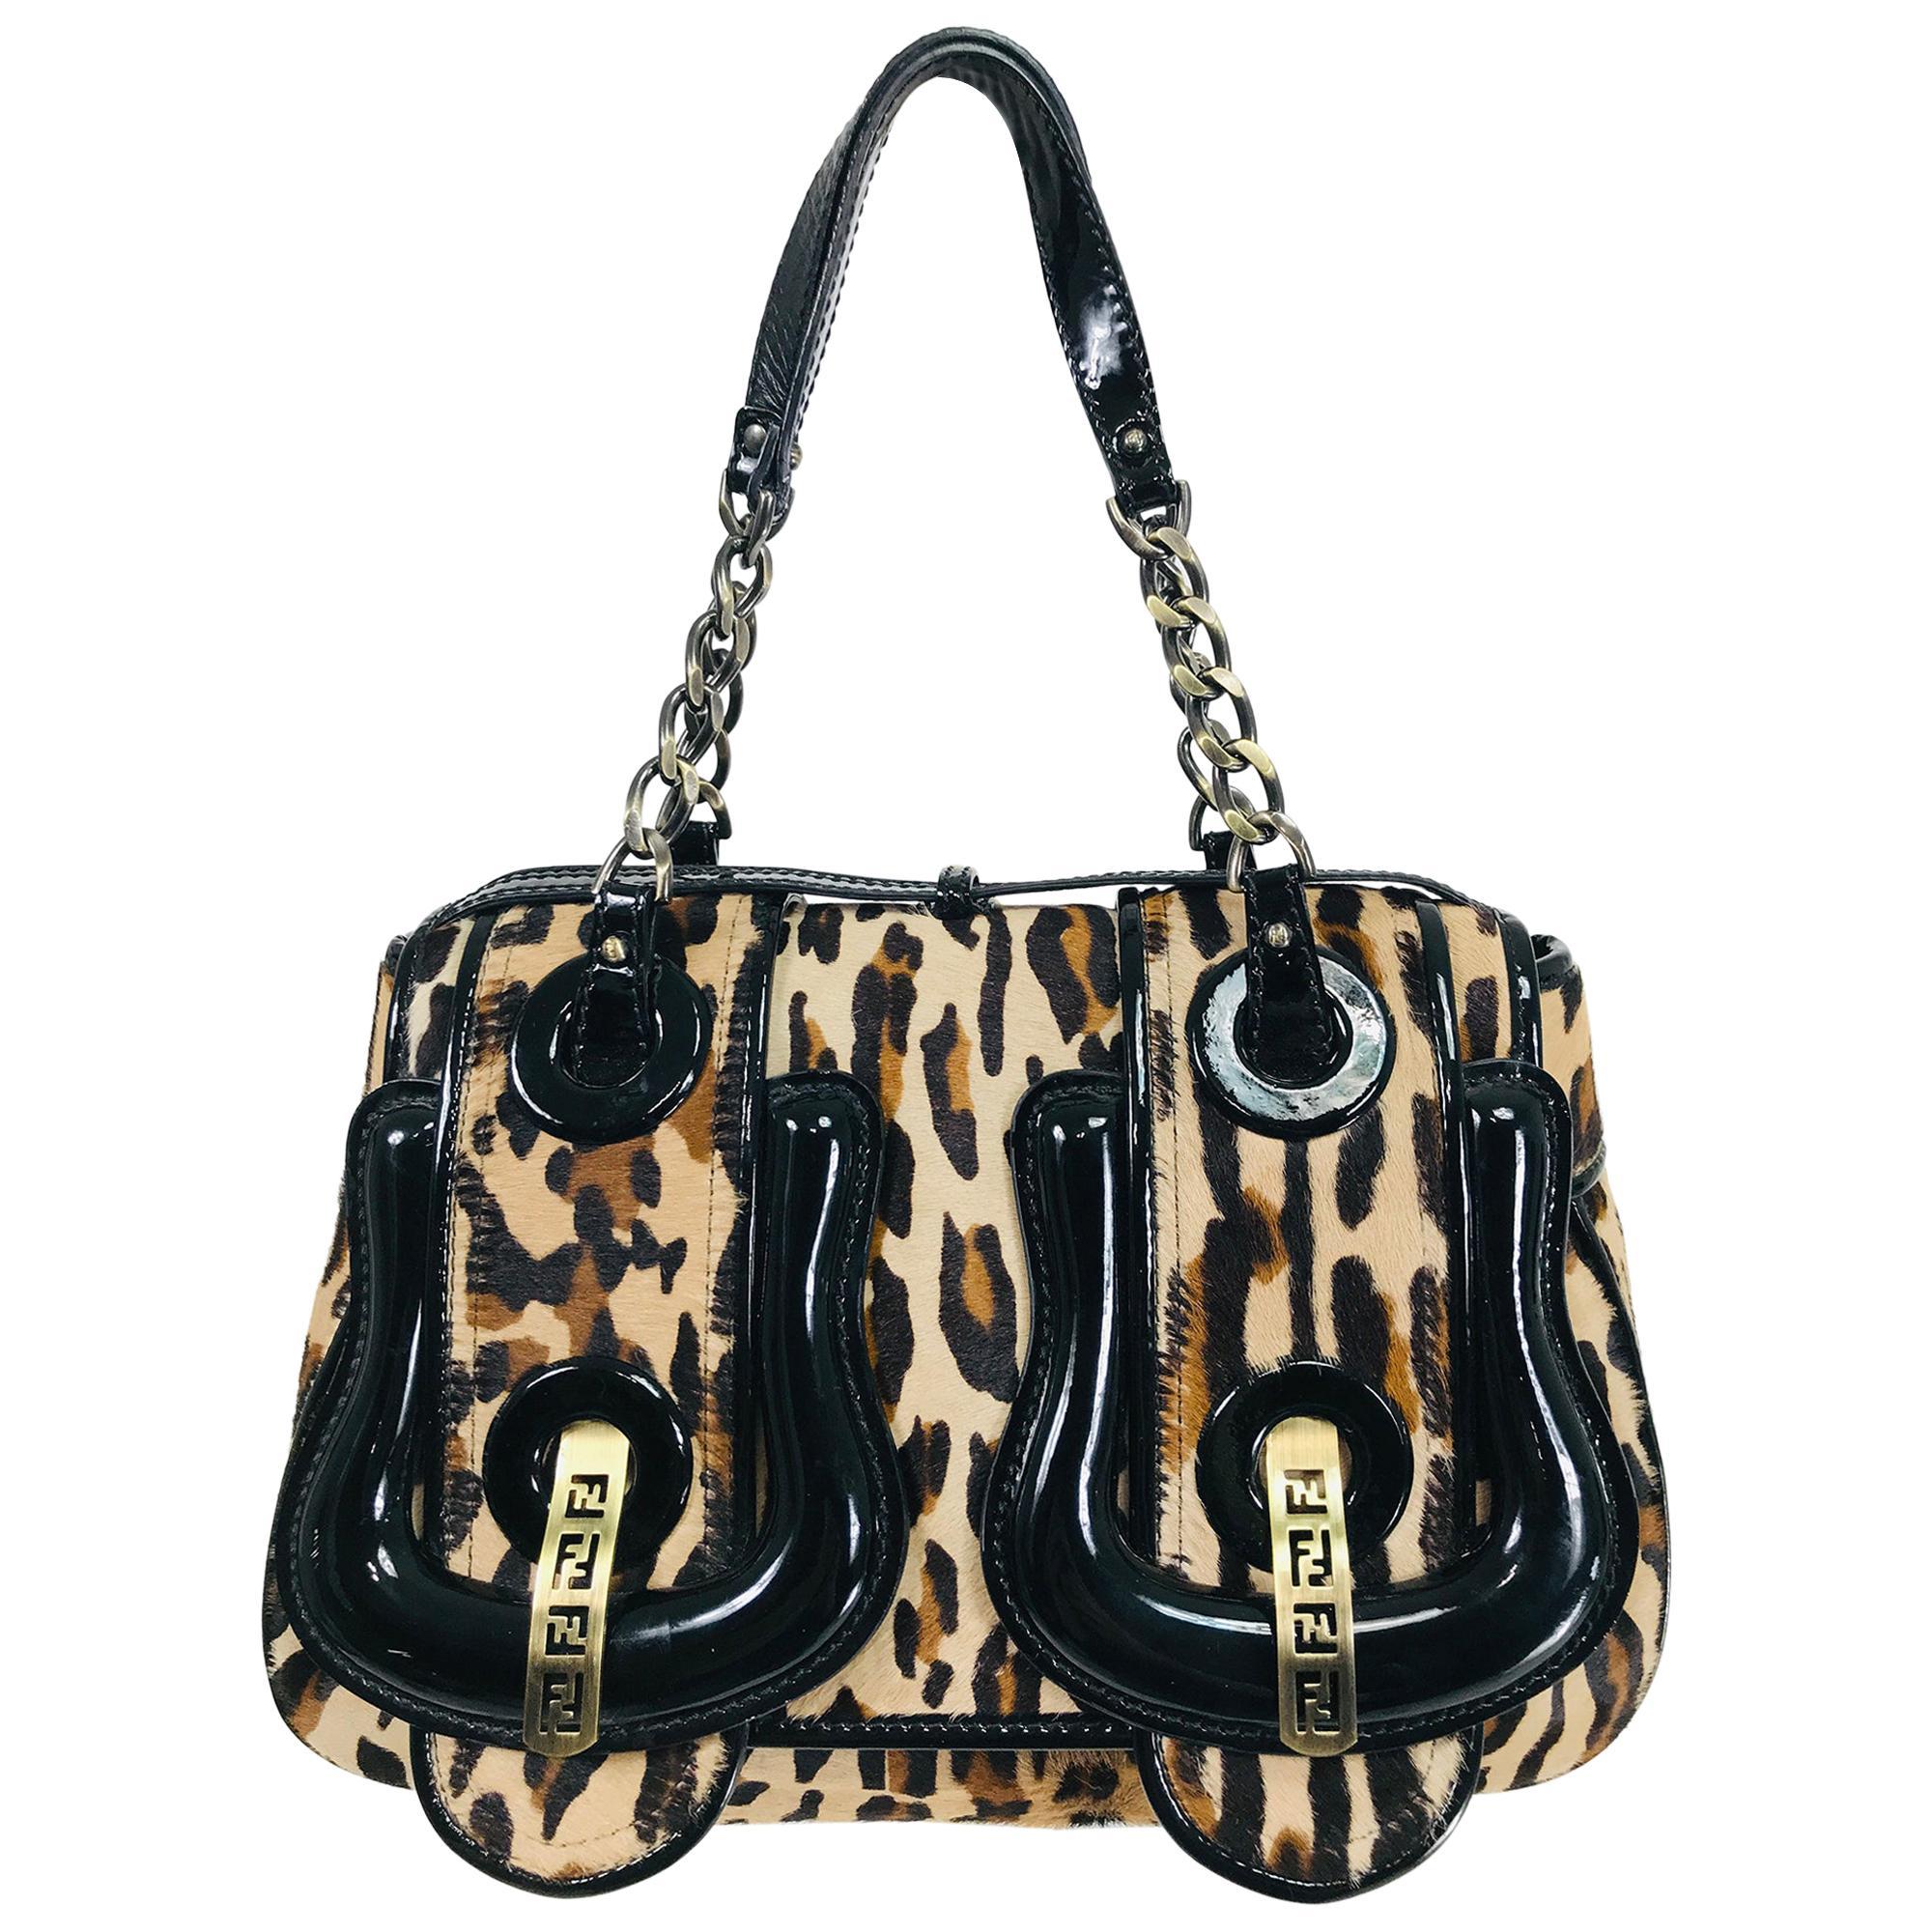 Fendi Leopard Print Calf Hair and Black Patent Leather B Bag